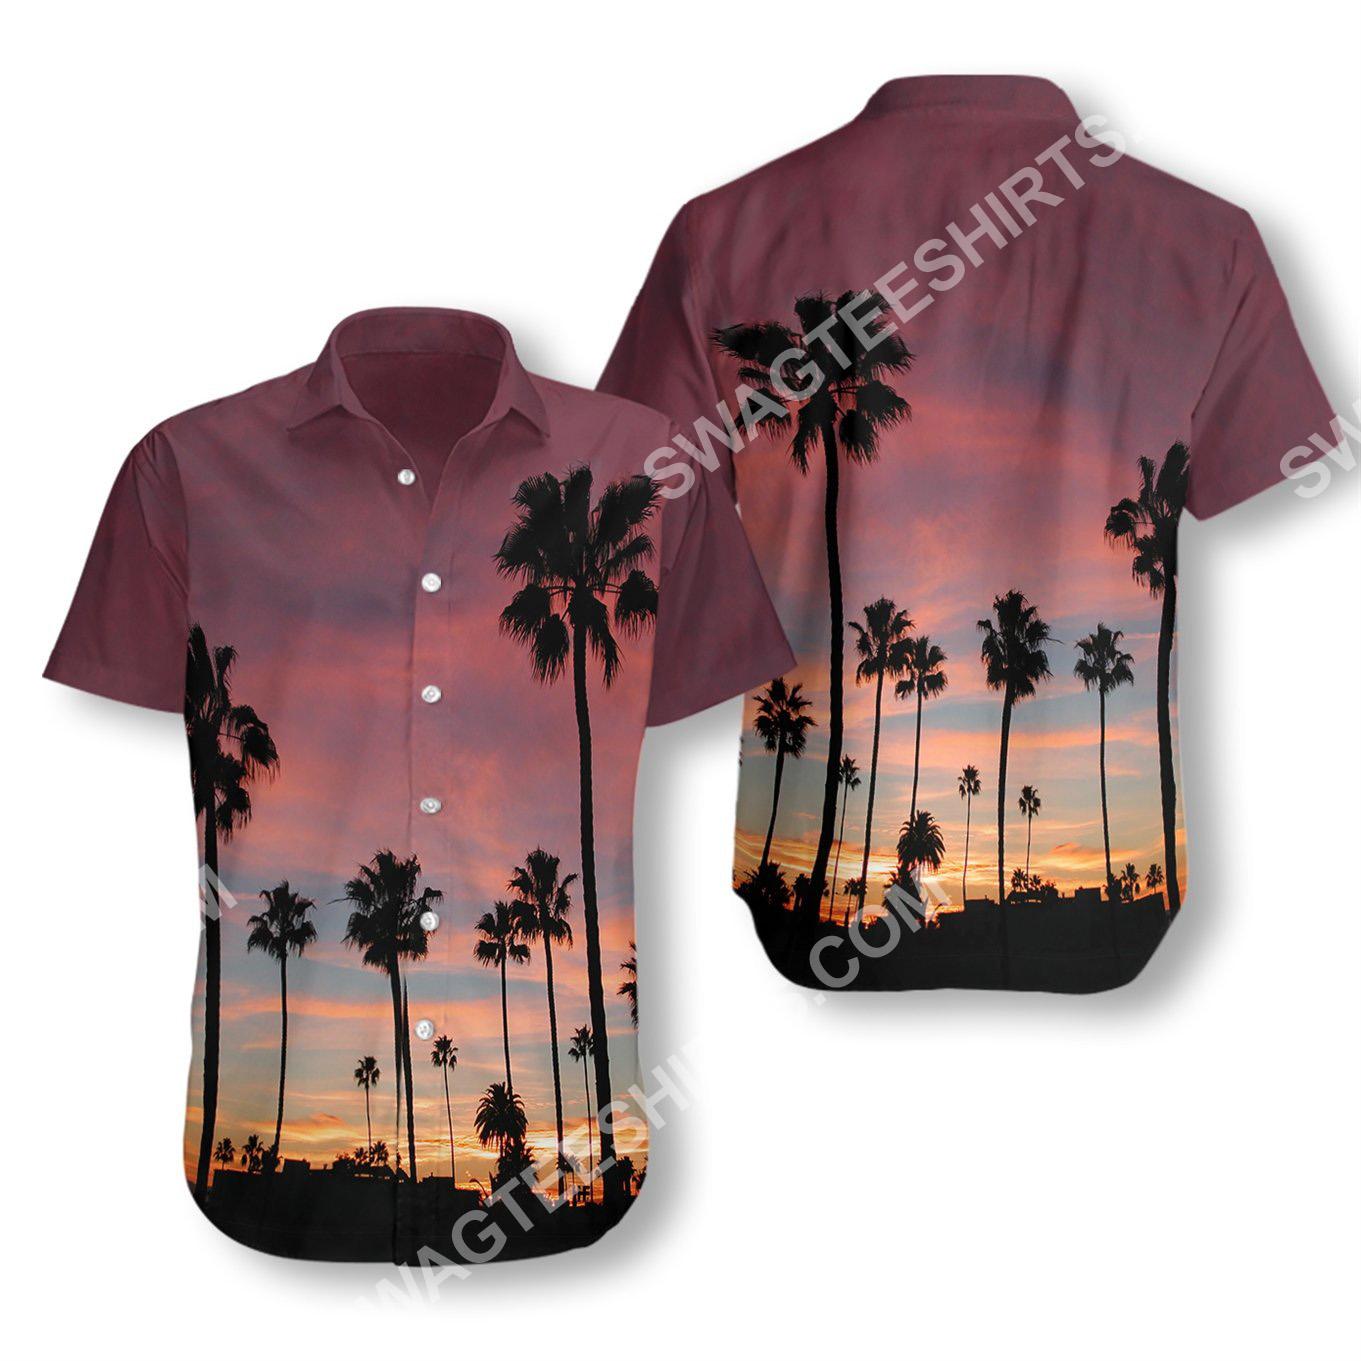 sunset venice beach all over printed hawaiian shirt 2(2) - Copy